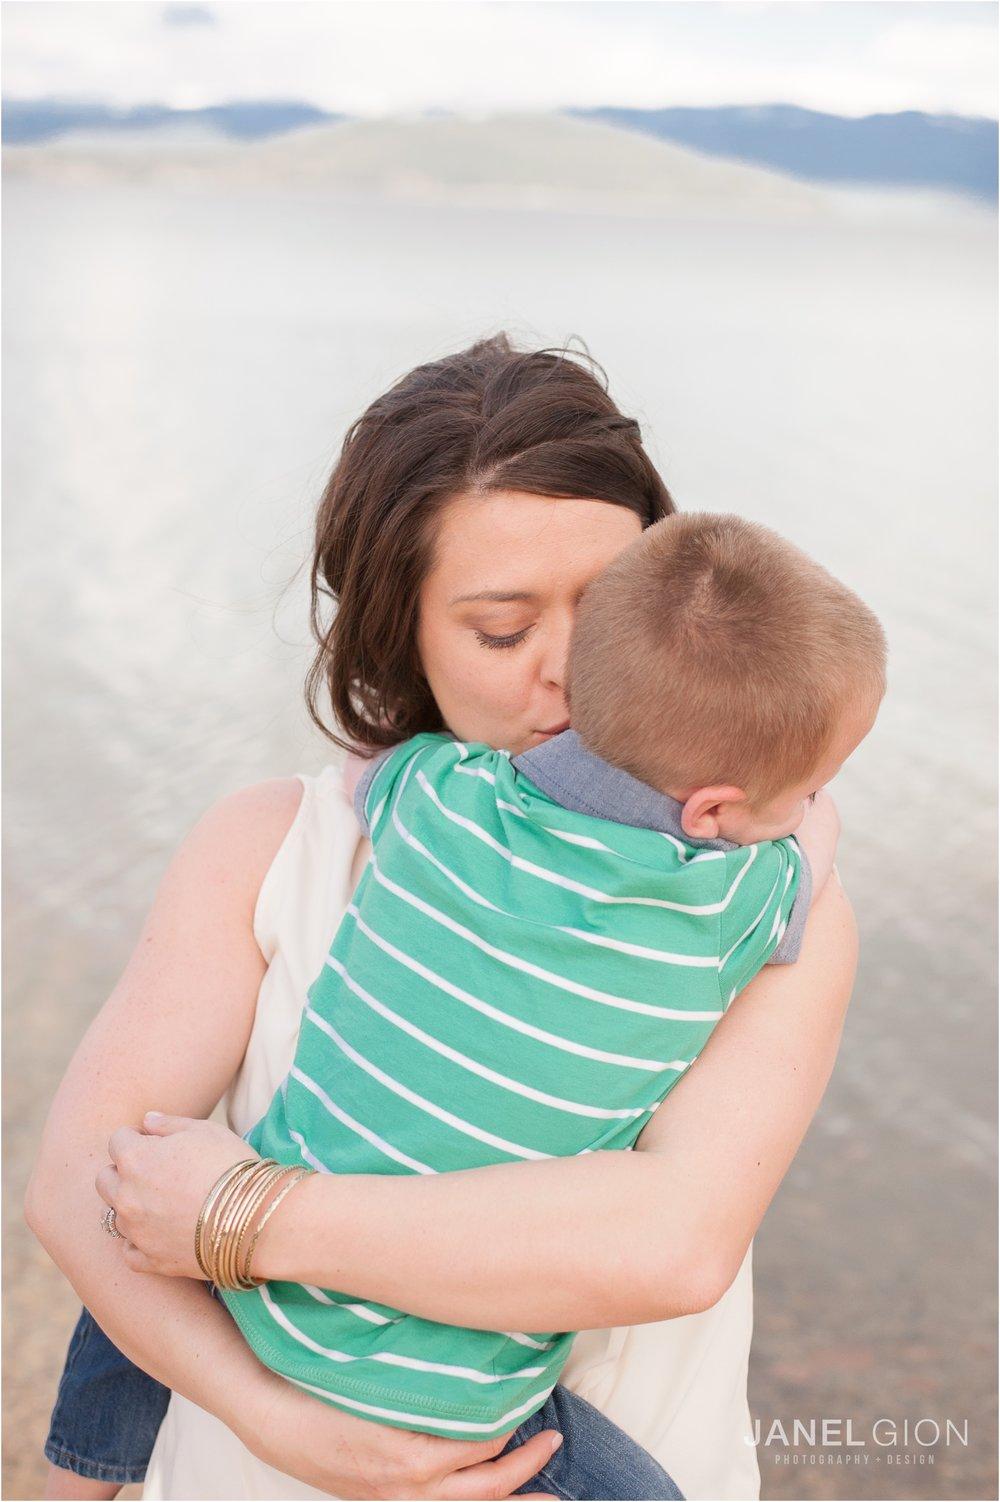 Janel-Gion-Sandpoint-Idaho-Portrait-Family-Photographer_0004